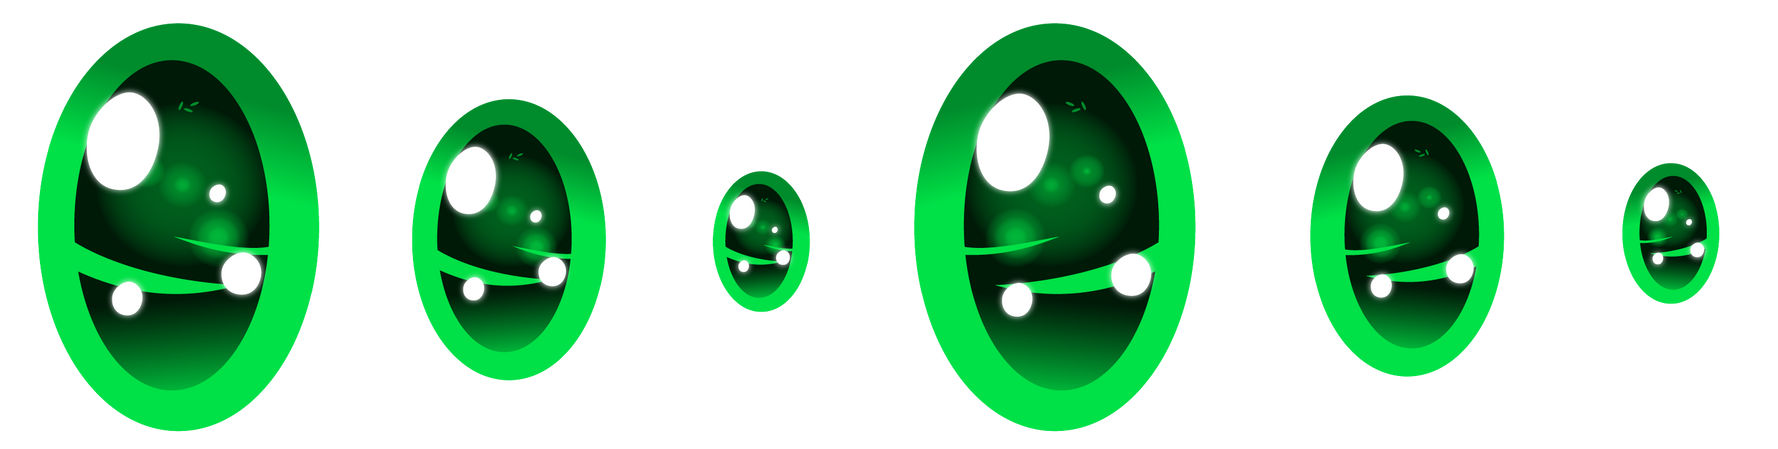 [SFM RESSOURCE] Anime Eyes Texture [DL] by BlueStreamBrony